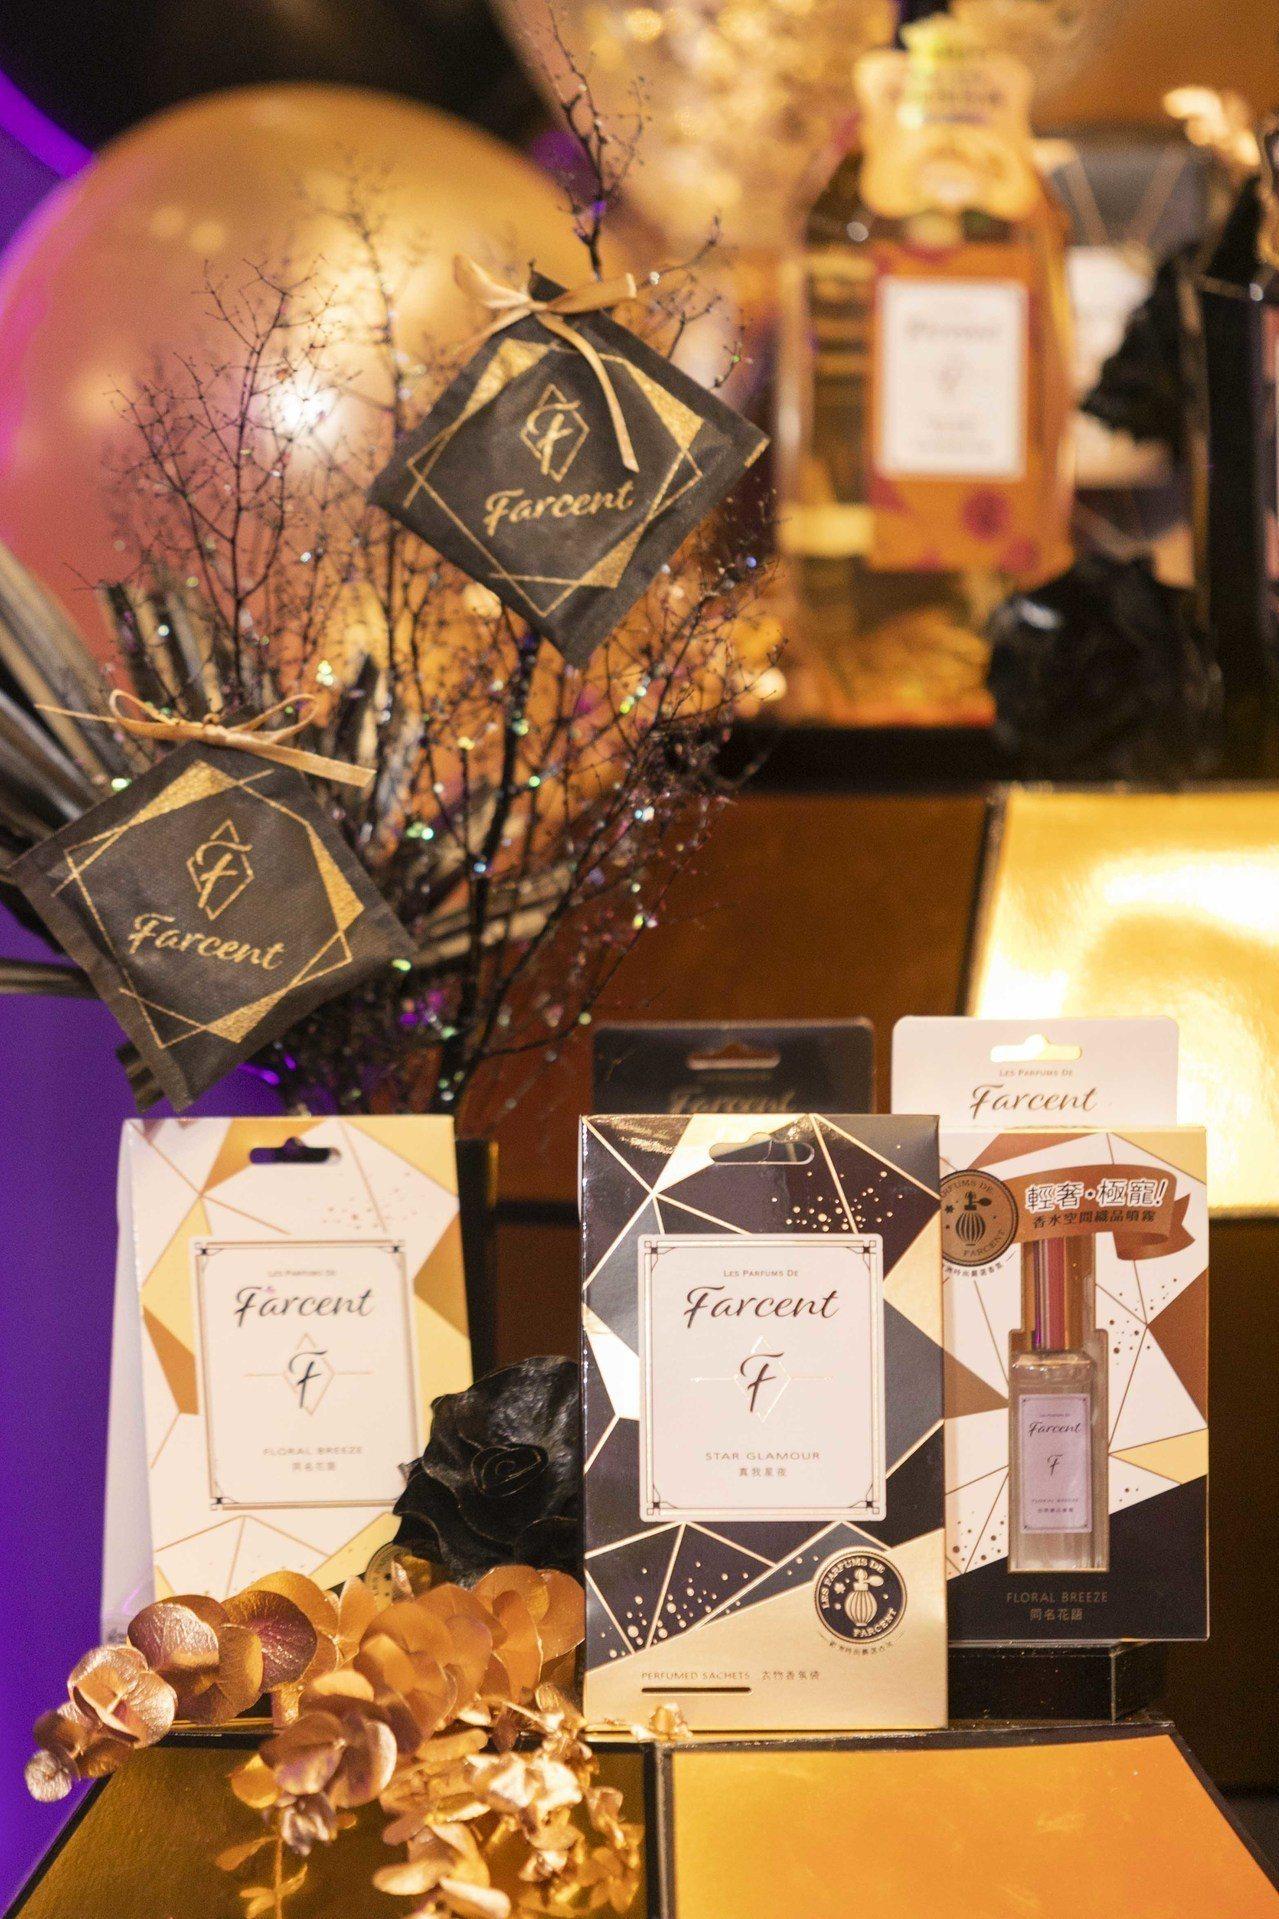 Les Parfums de Farcent今年春夏再推出全新「璀璨名媛系列」。...